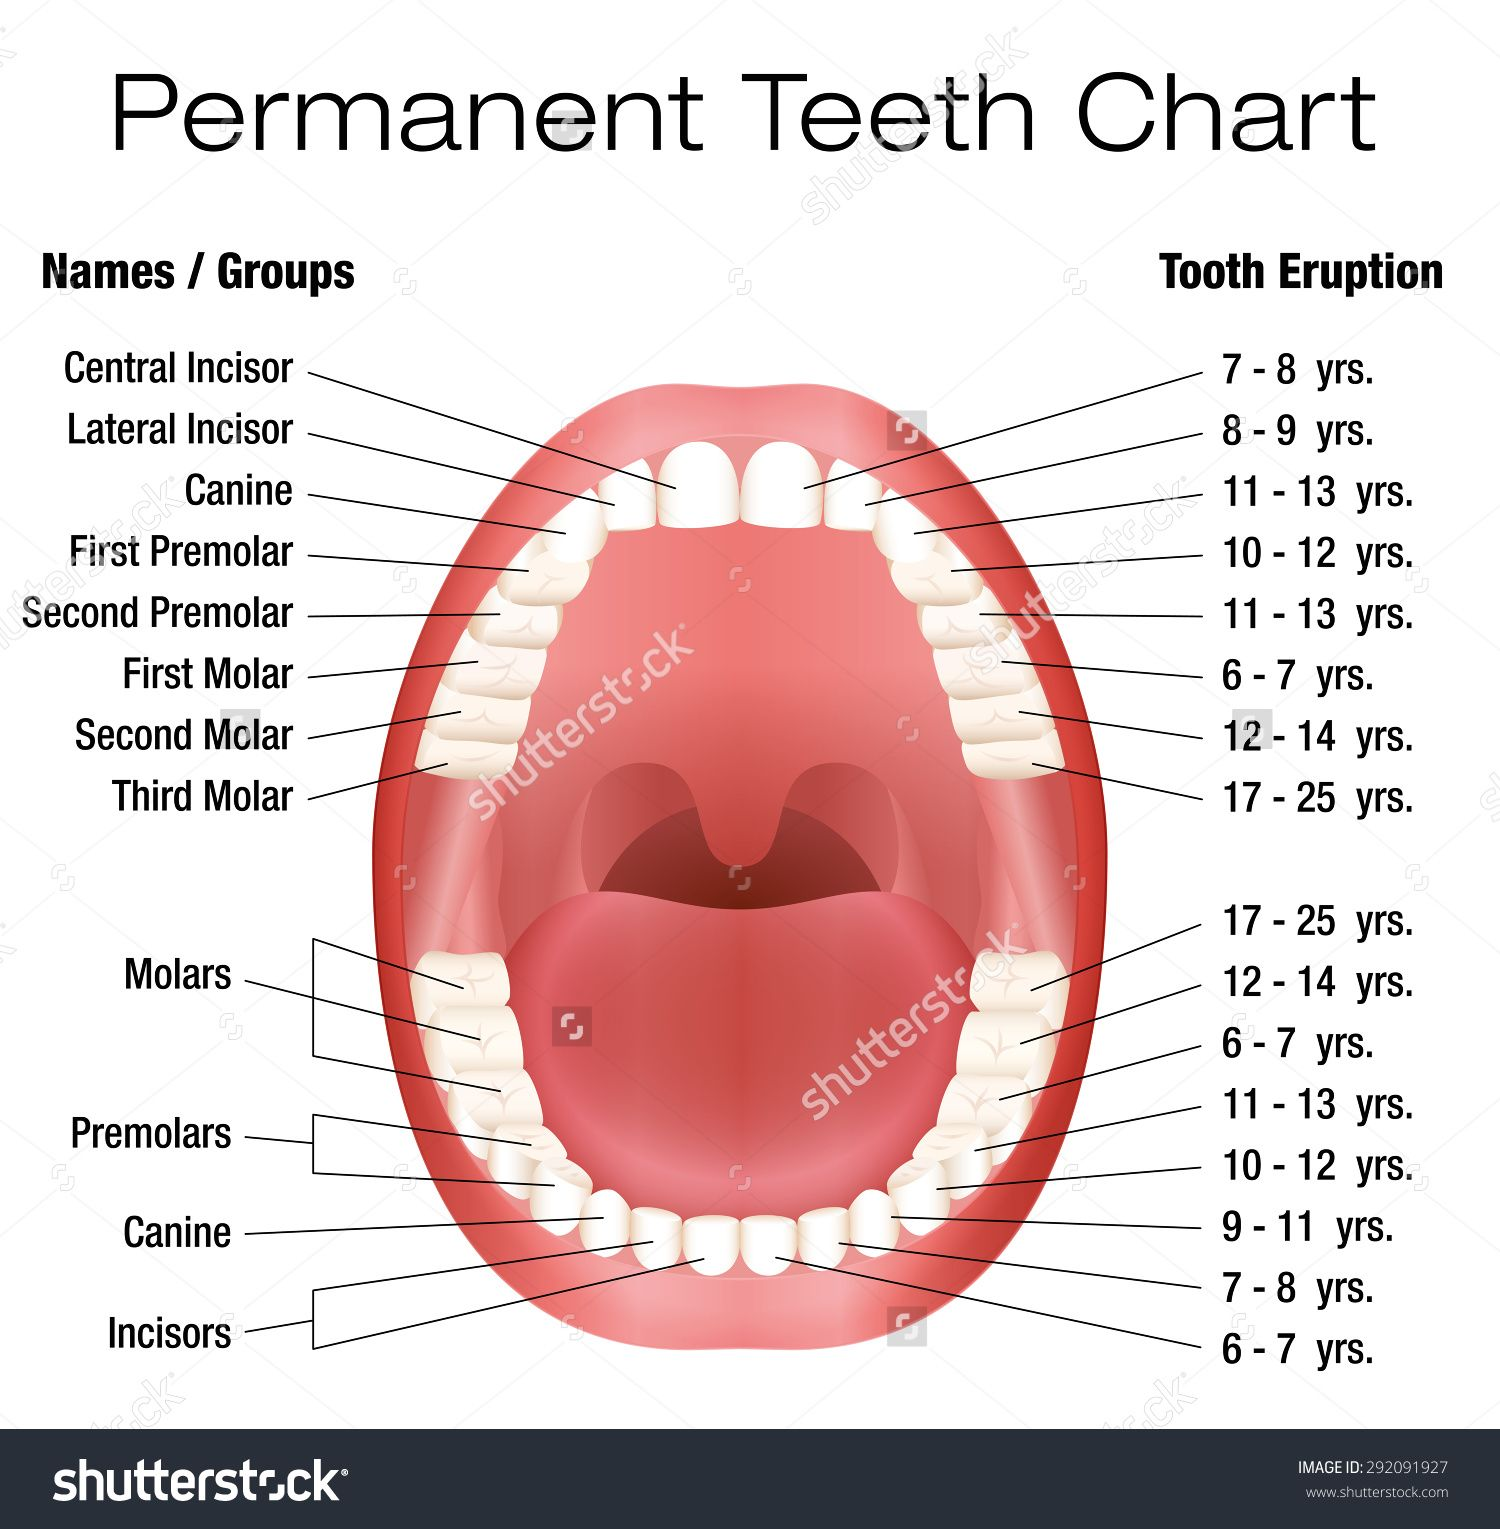 teeth eruption chart teeth images human teeth body organs tooth diagram [ 1500 x 1529 Pixel ]